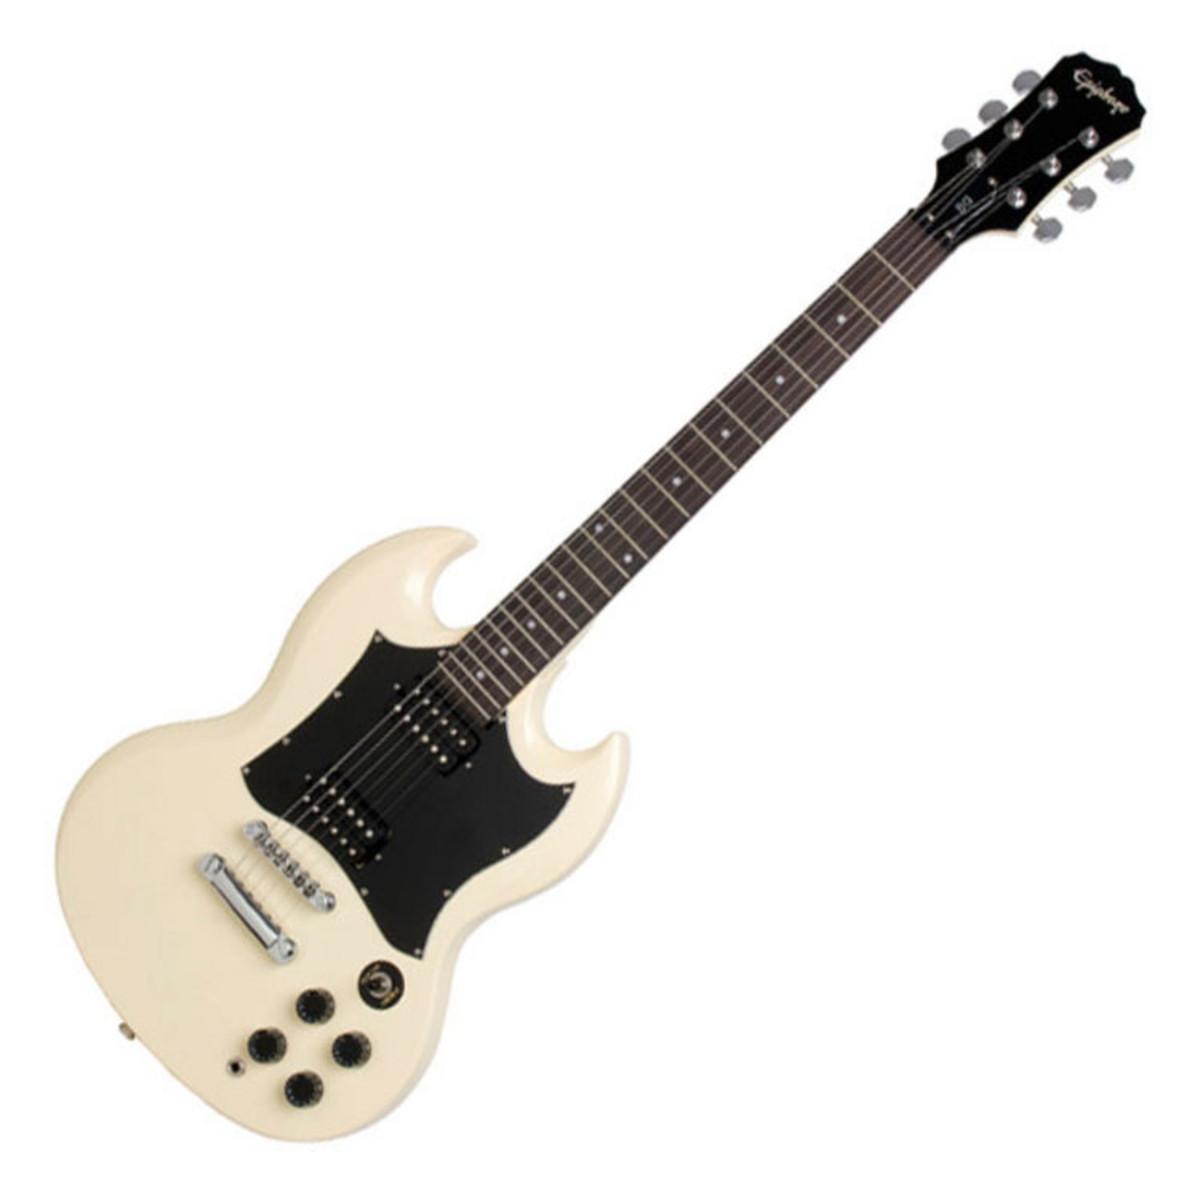 disc epiphone sg g 310 electric guitar vintage white at gear4music. Black Bedroom Furniture Sets. Home Design Ideas